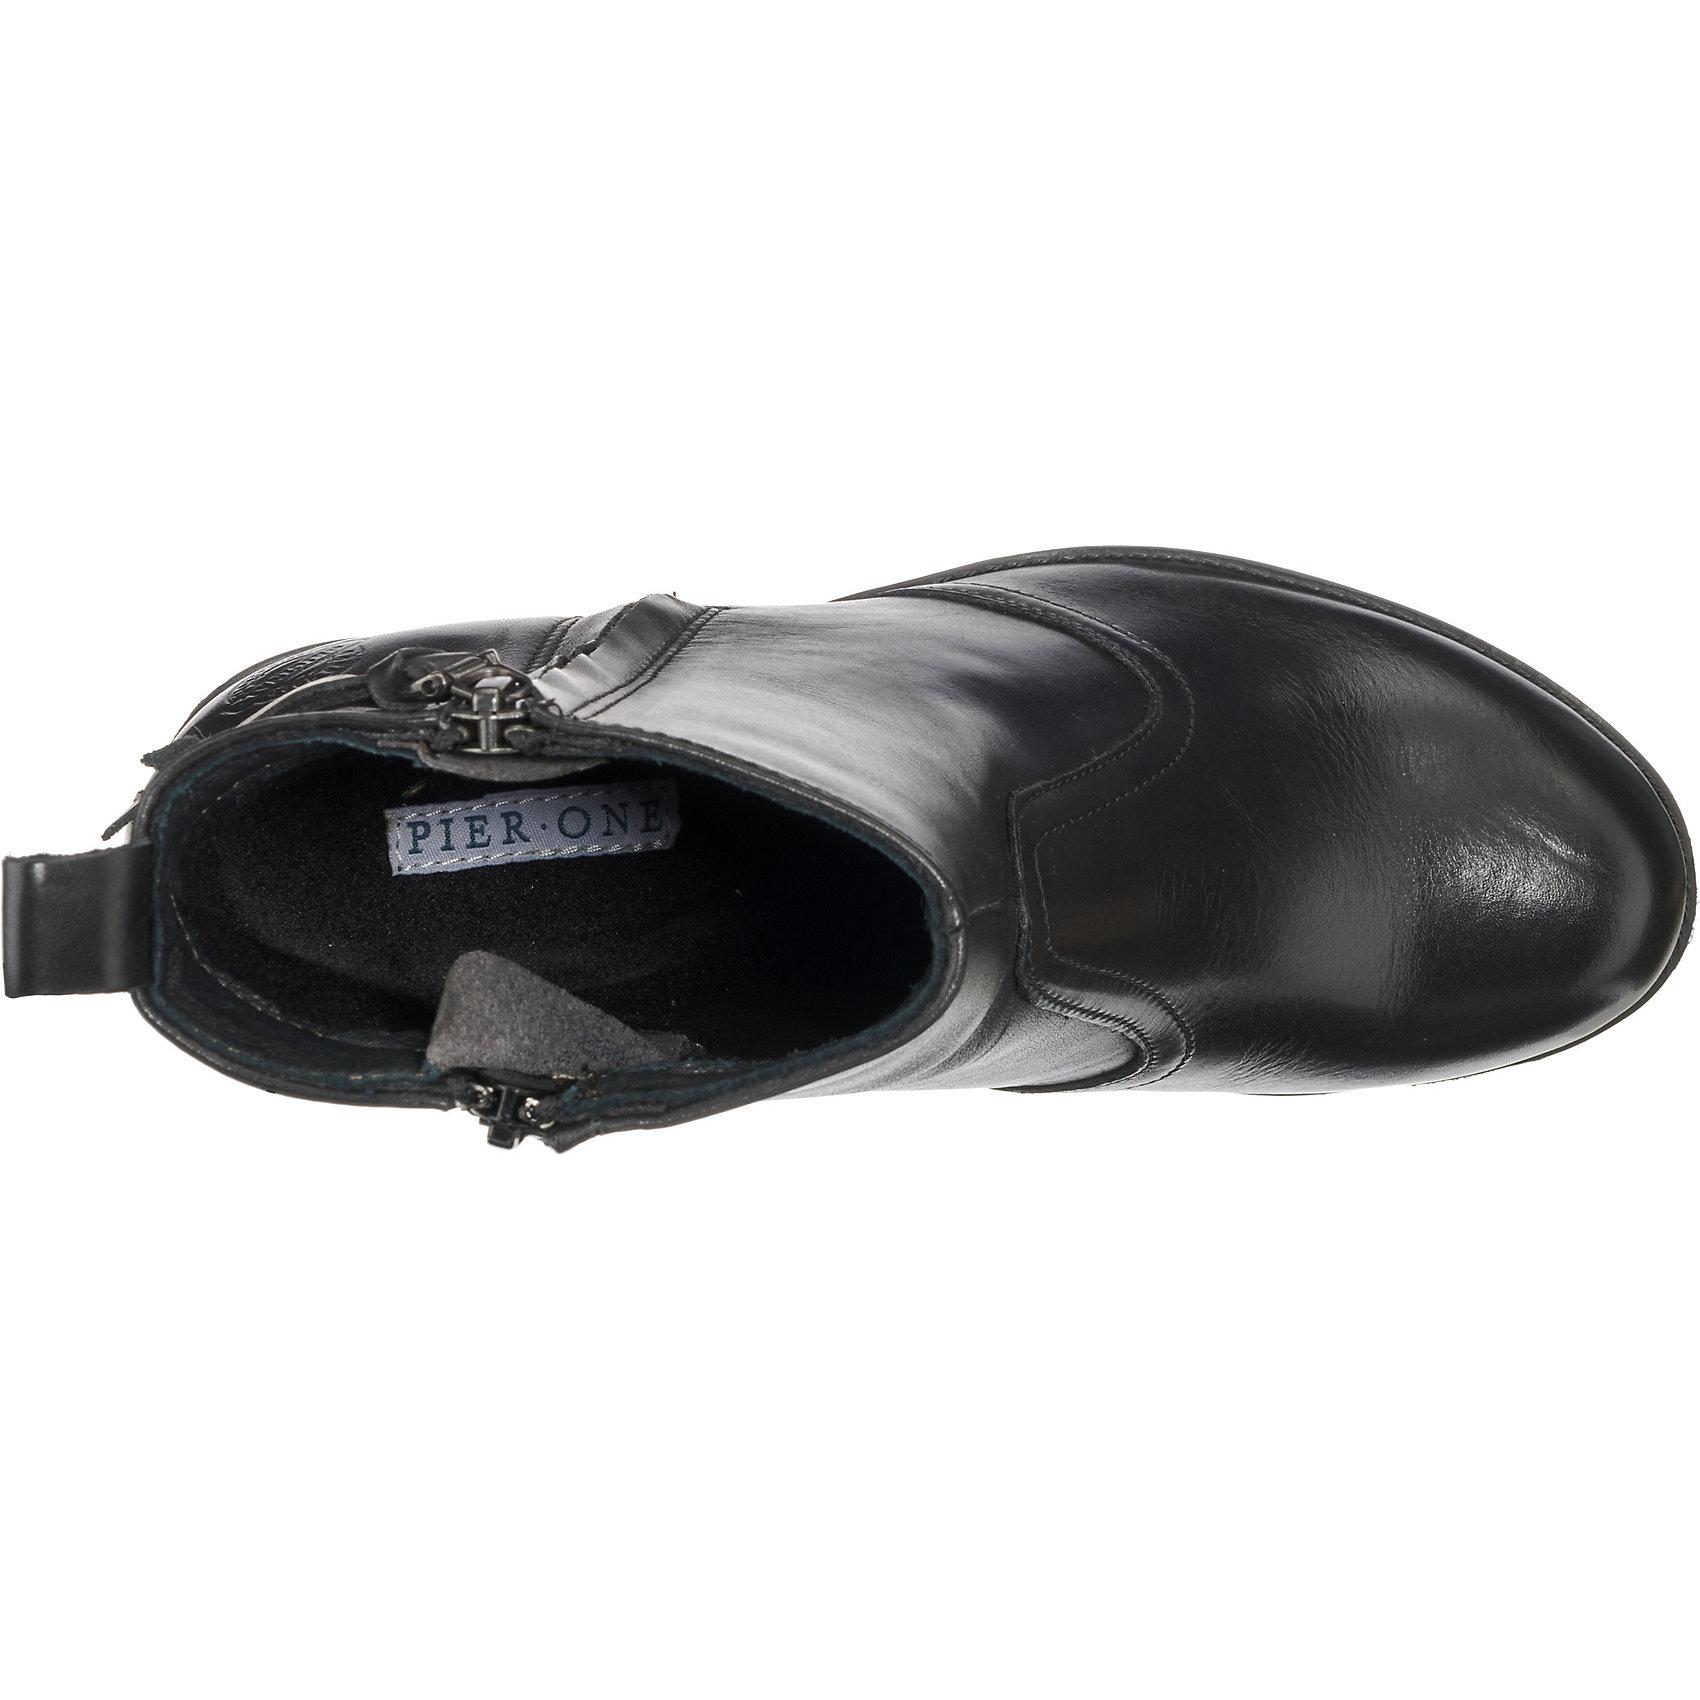 4dd9f5d4f228 ... Nike Men s Size Size Size 11 Air Huarache Drift Running Shoes Wolf Grey White  AH7334 ...